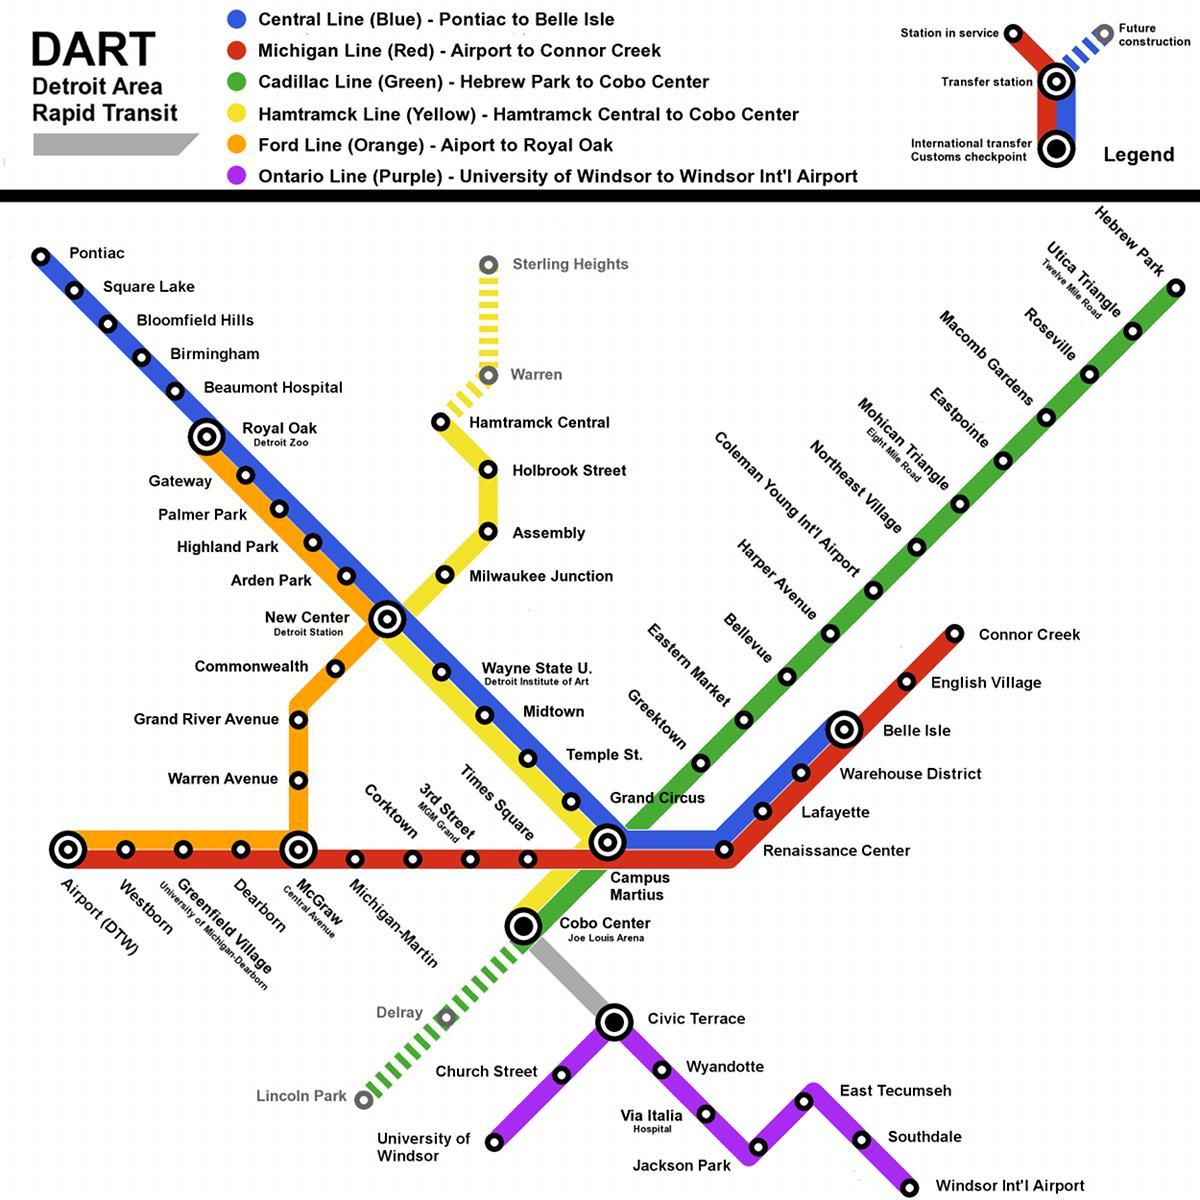 Detroit Light Rail Map Detroit Train Map Michigan USA - Railway map usa